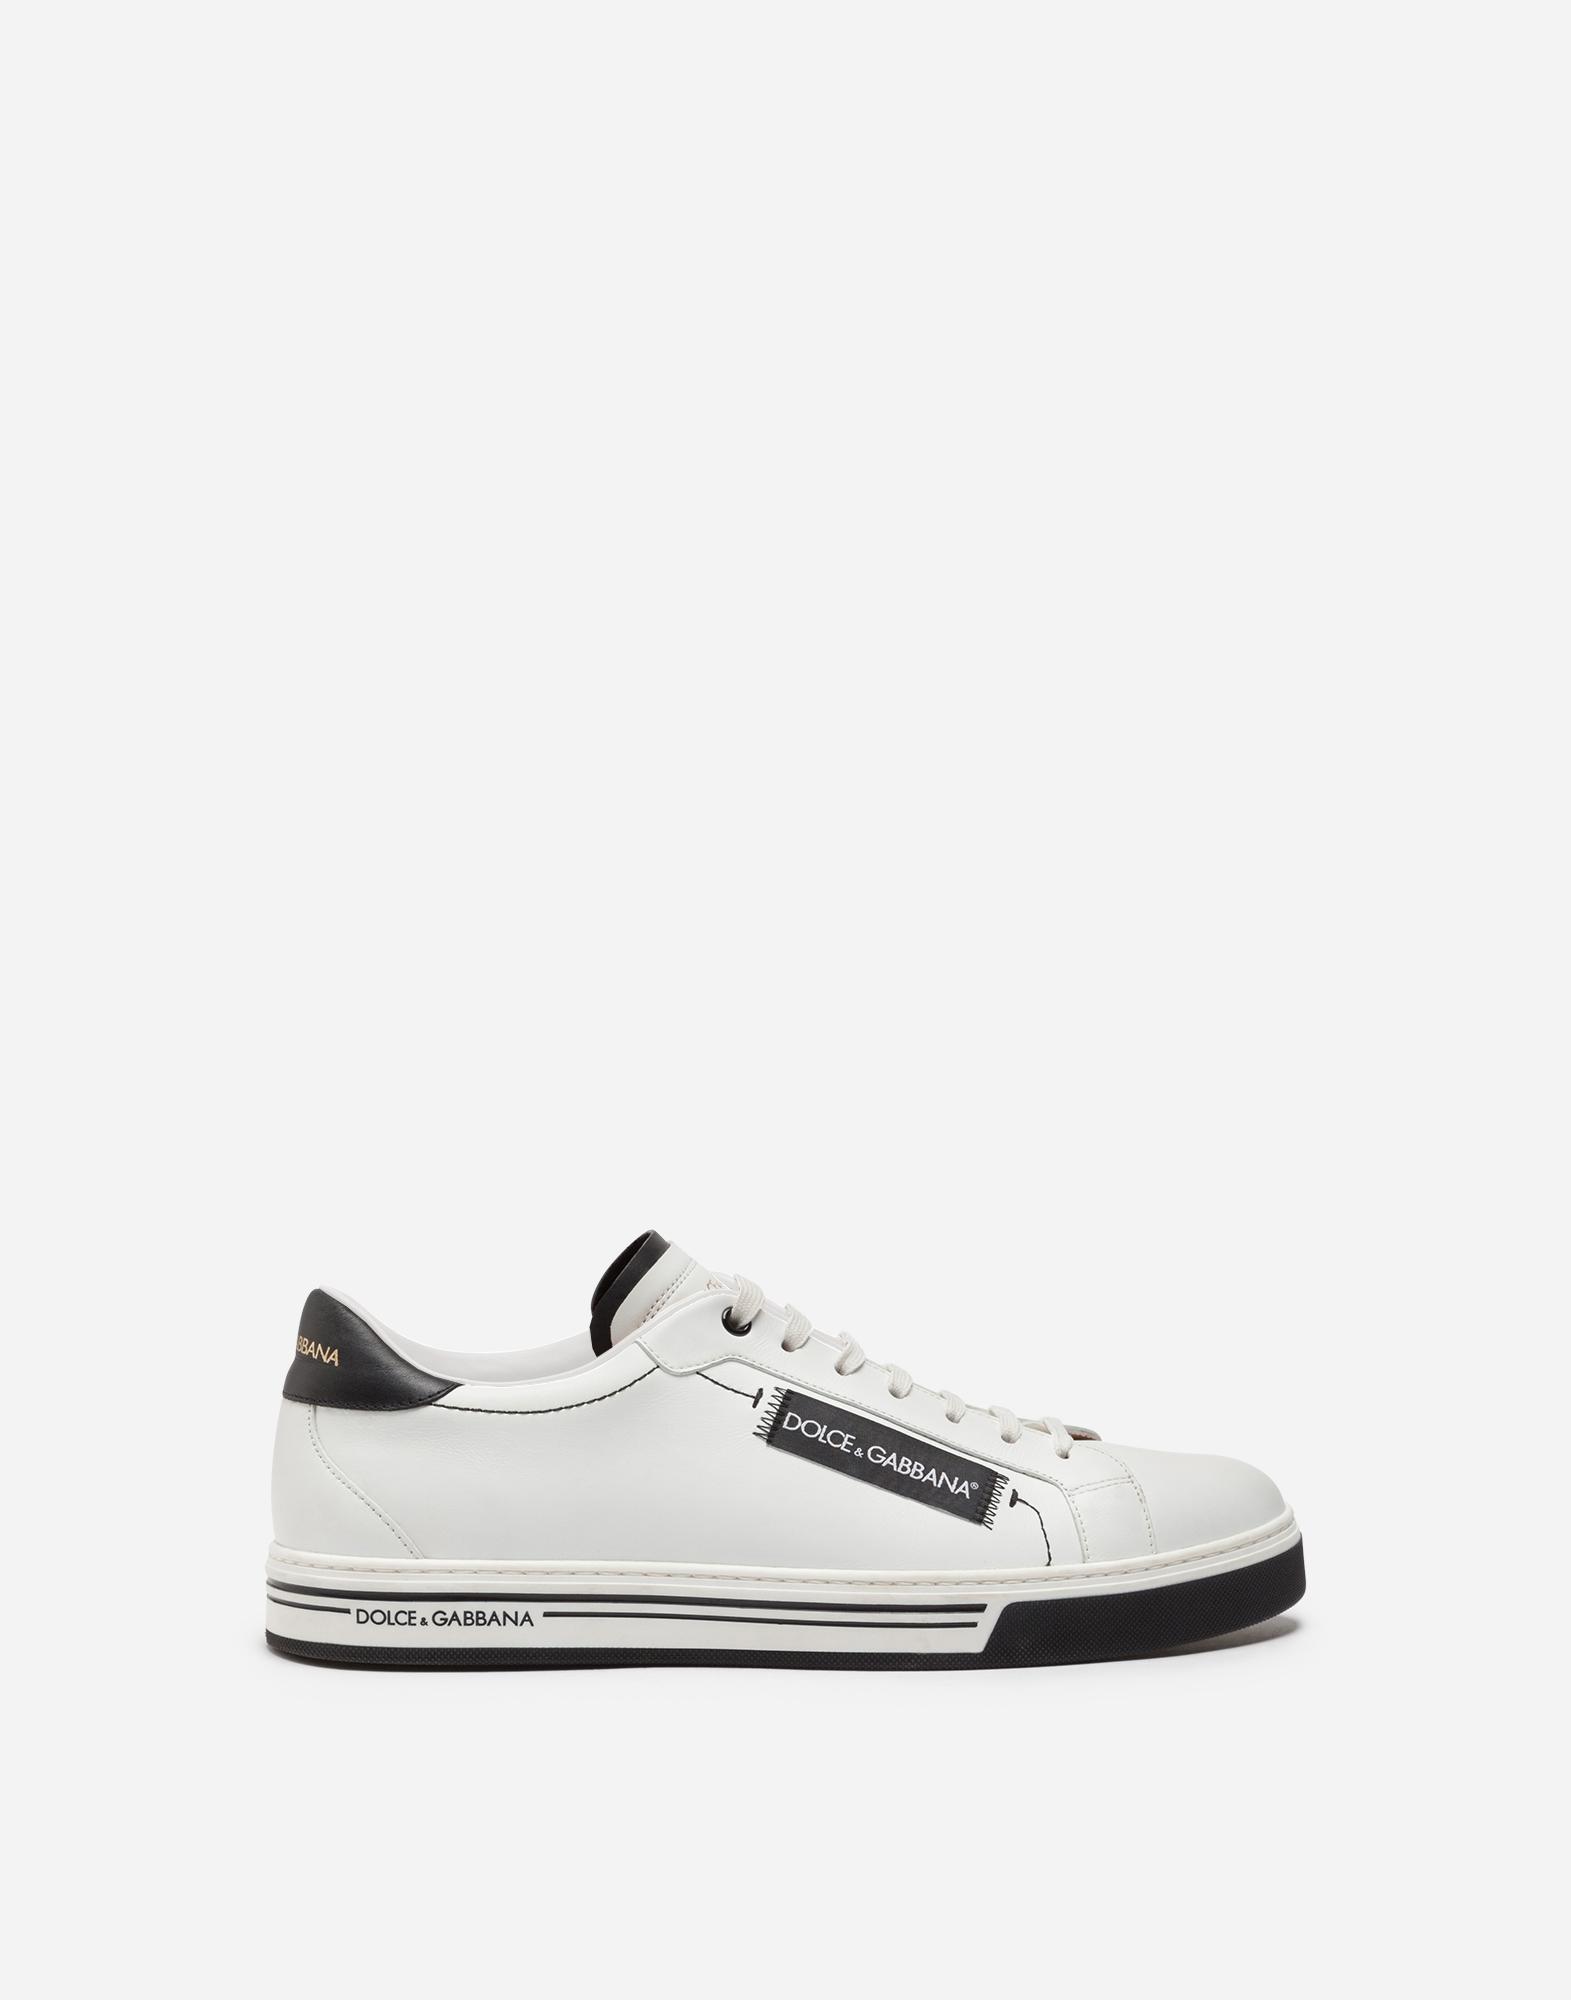 Roma Sneakers In Nappa Calfskin - Men